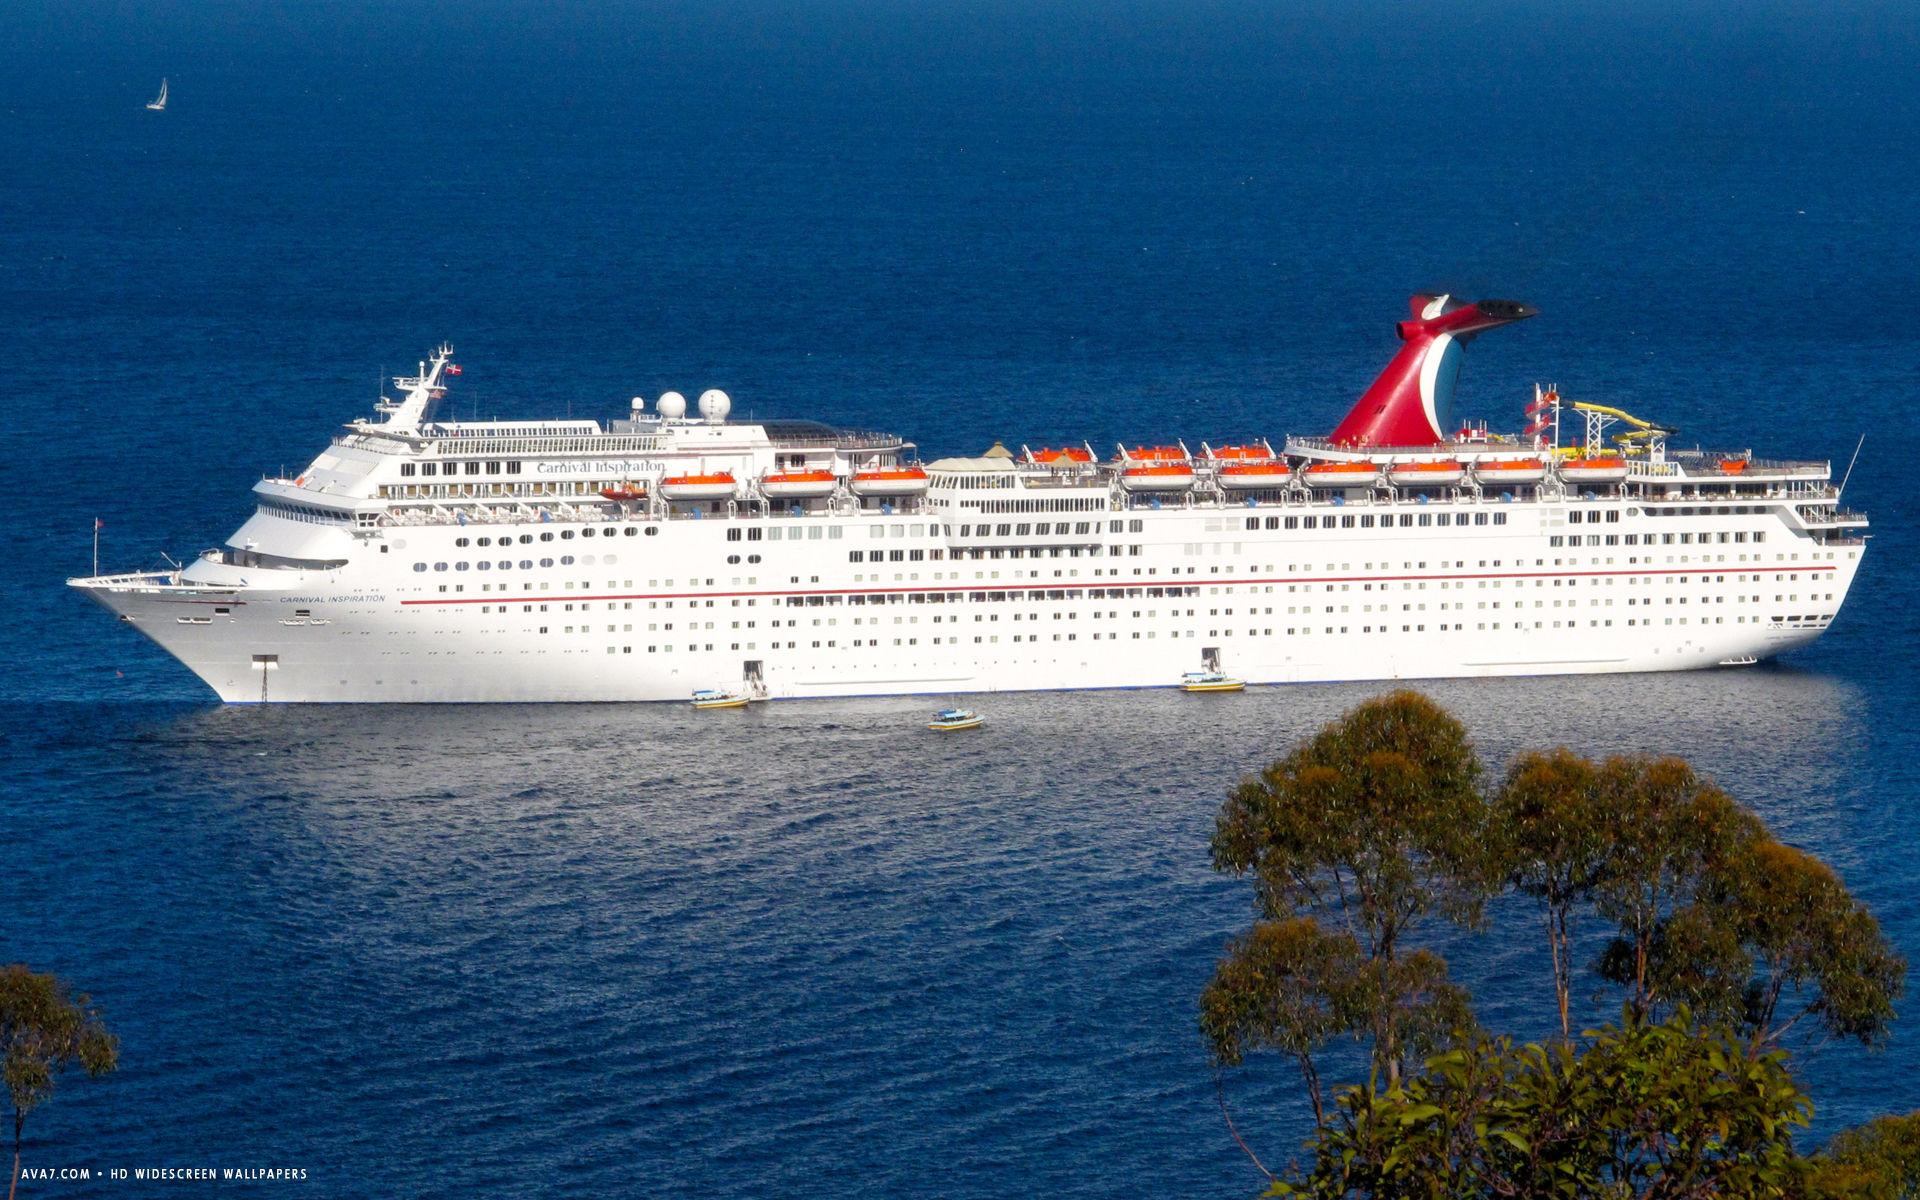 carnival inspiration cruise ship hd widescreen wallpaper cruise 1920x1200